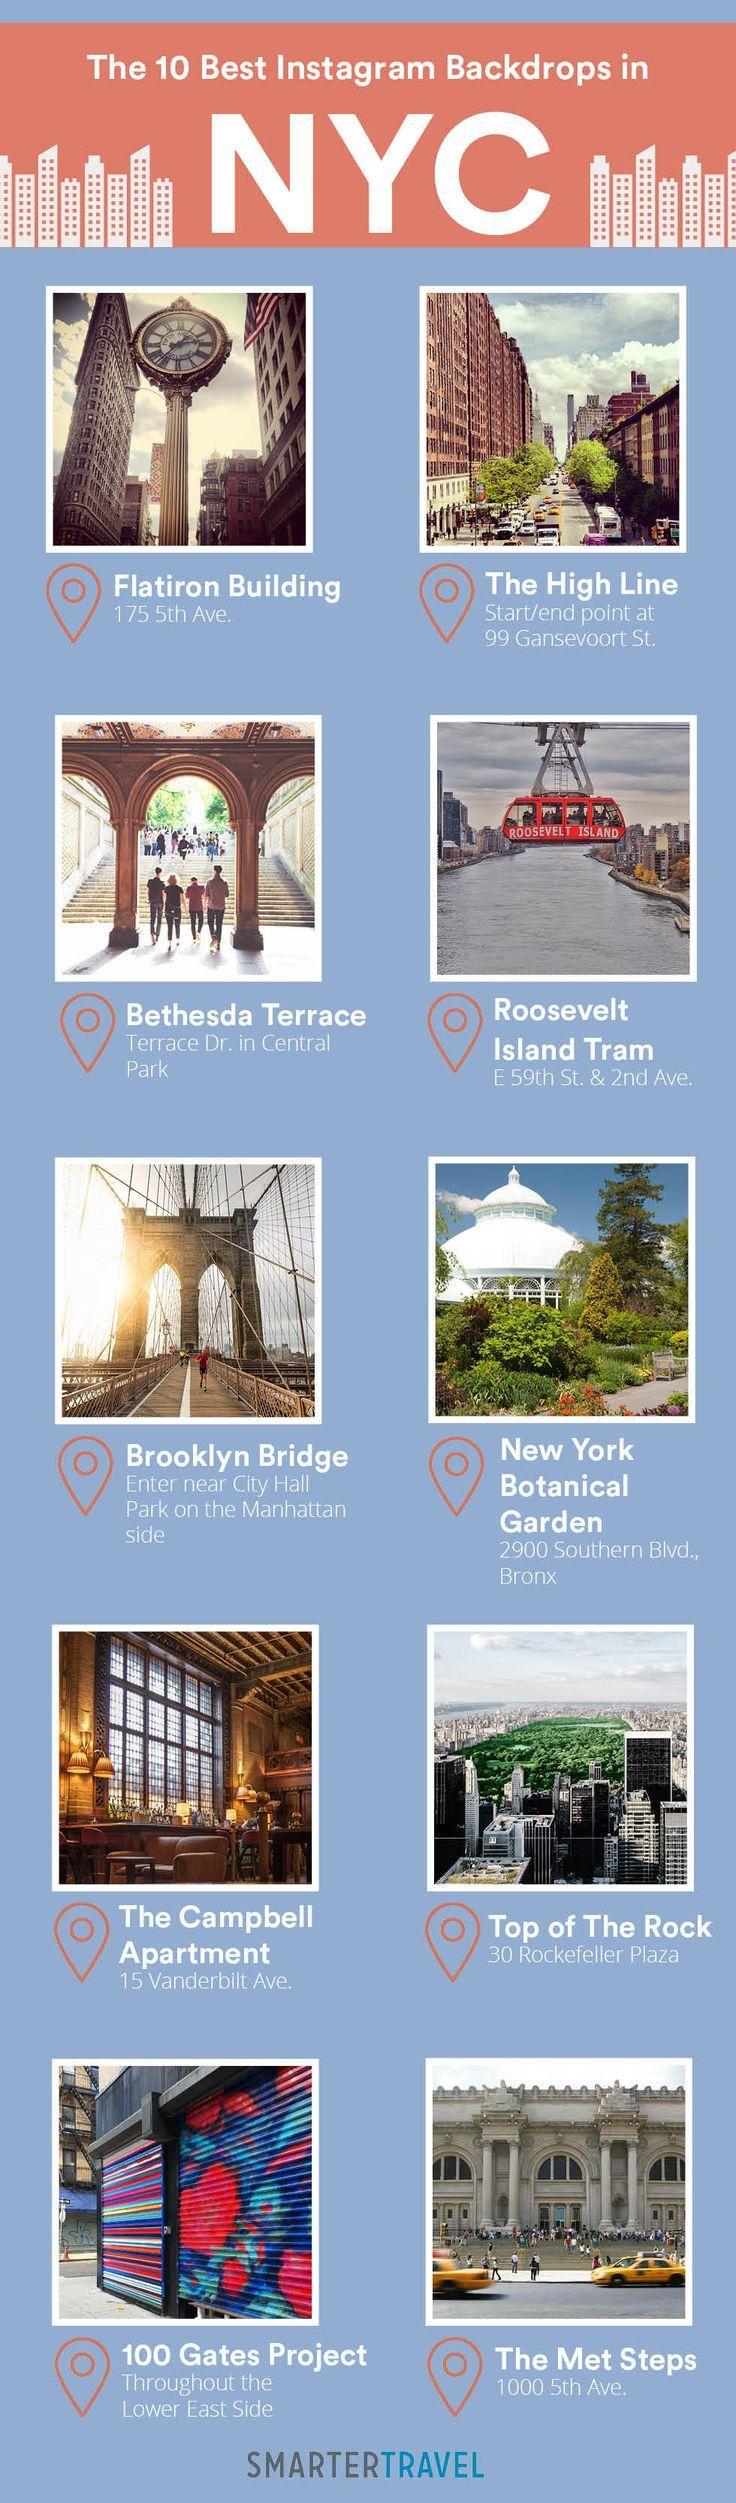 The best Instagram spots in NYC!